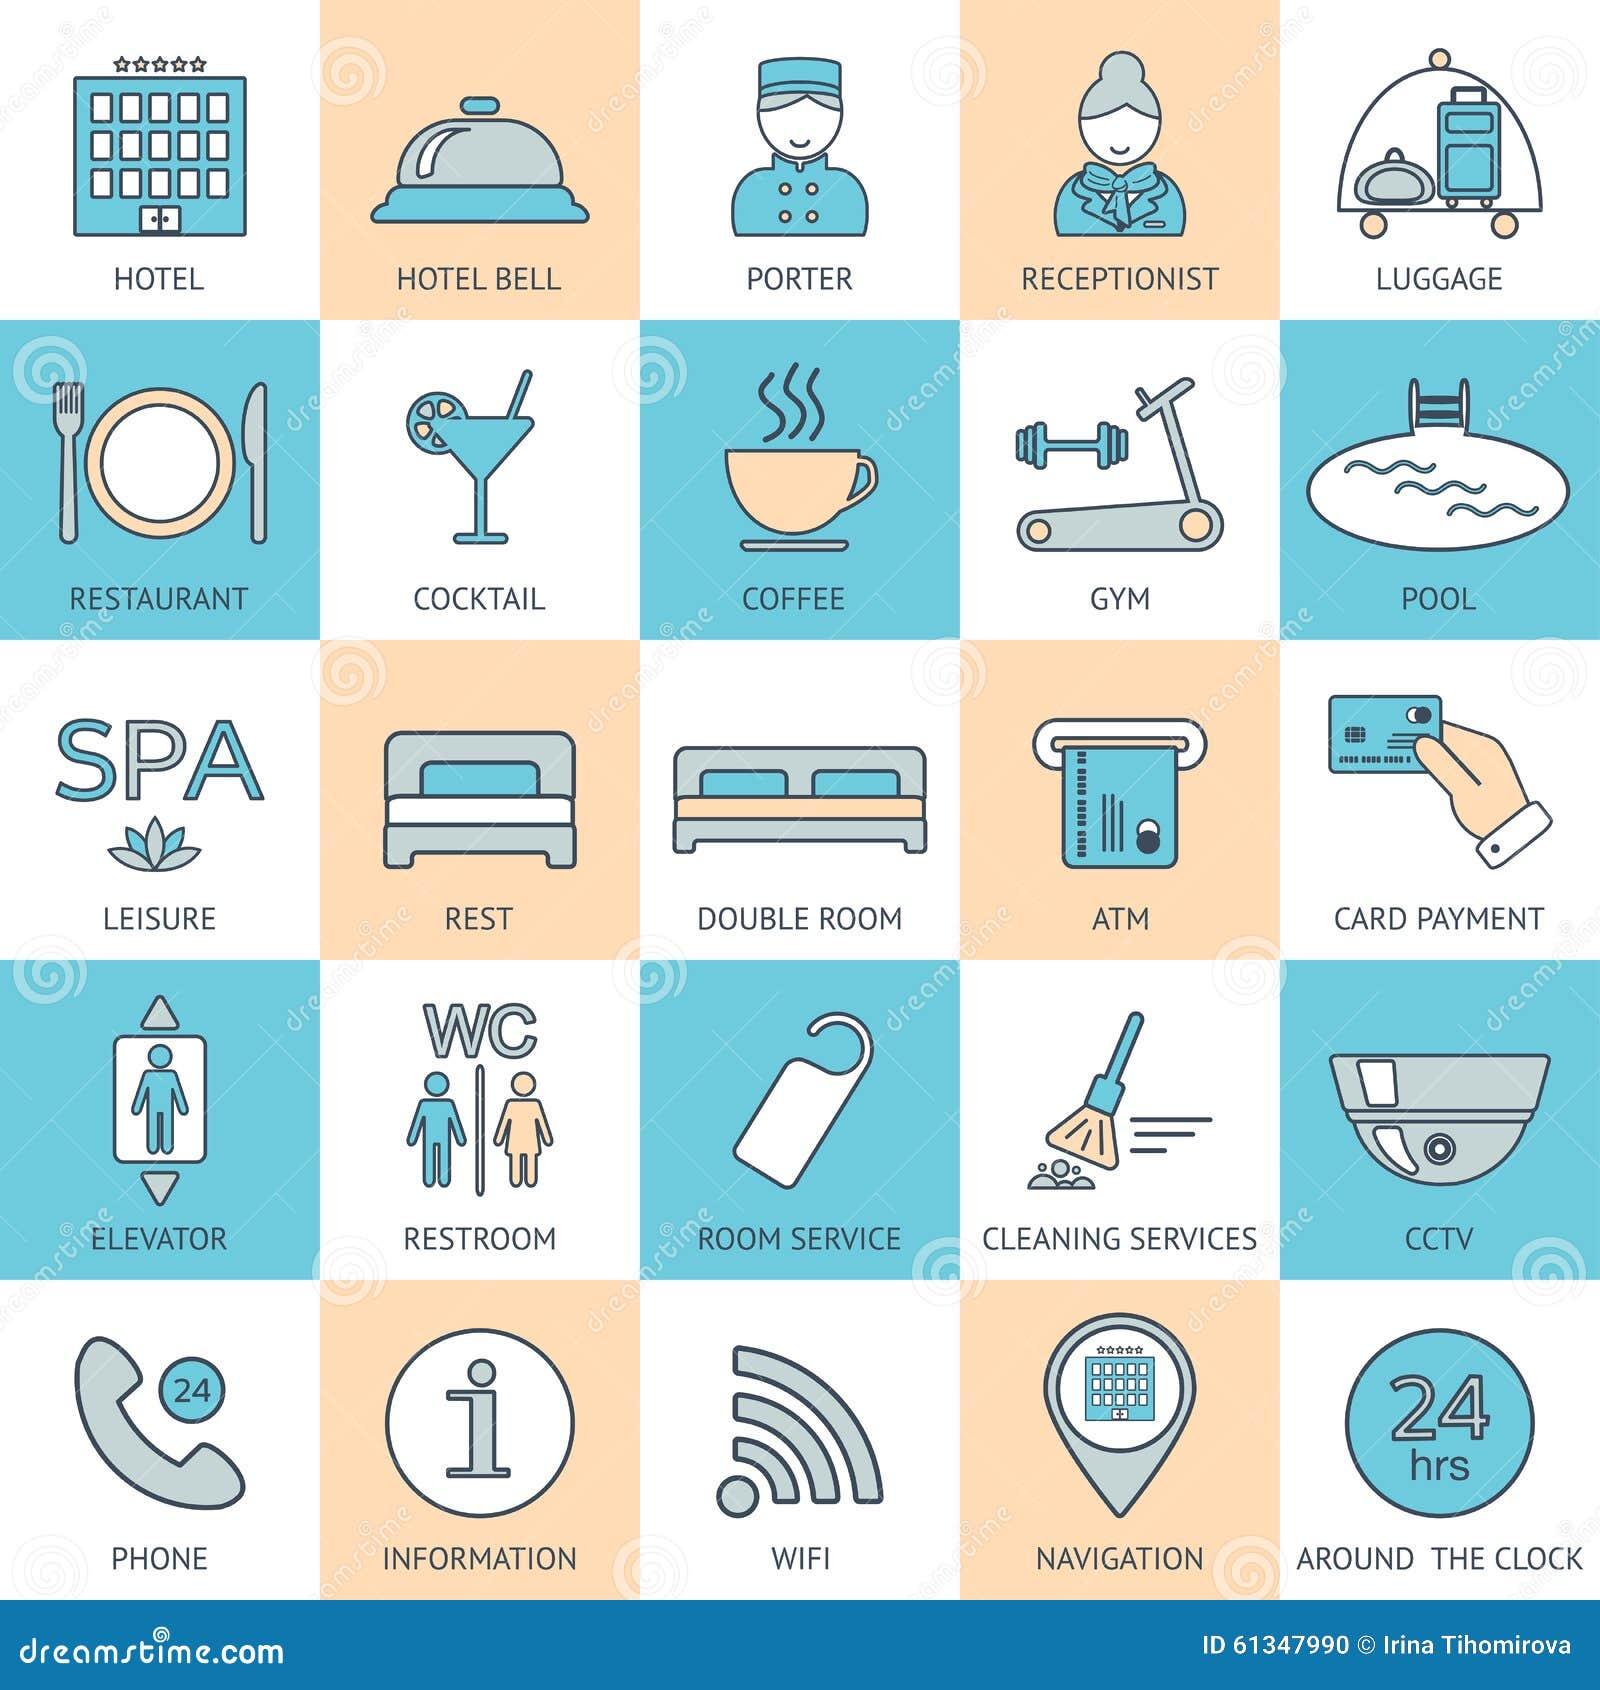 25 Line Hotel Services Icons Color Block Logo Glyphs